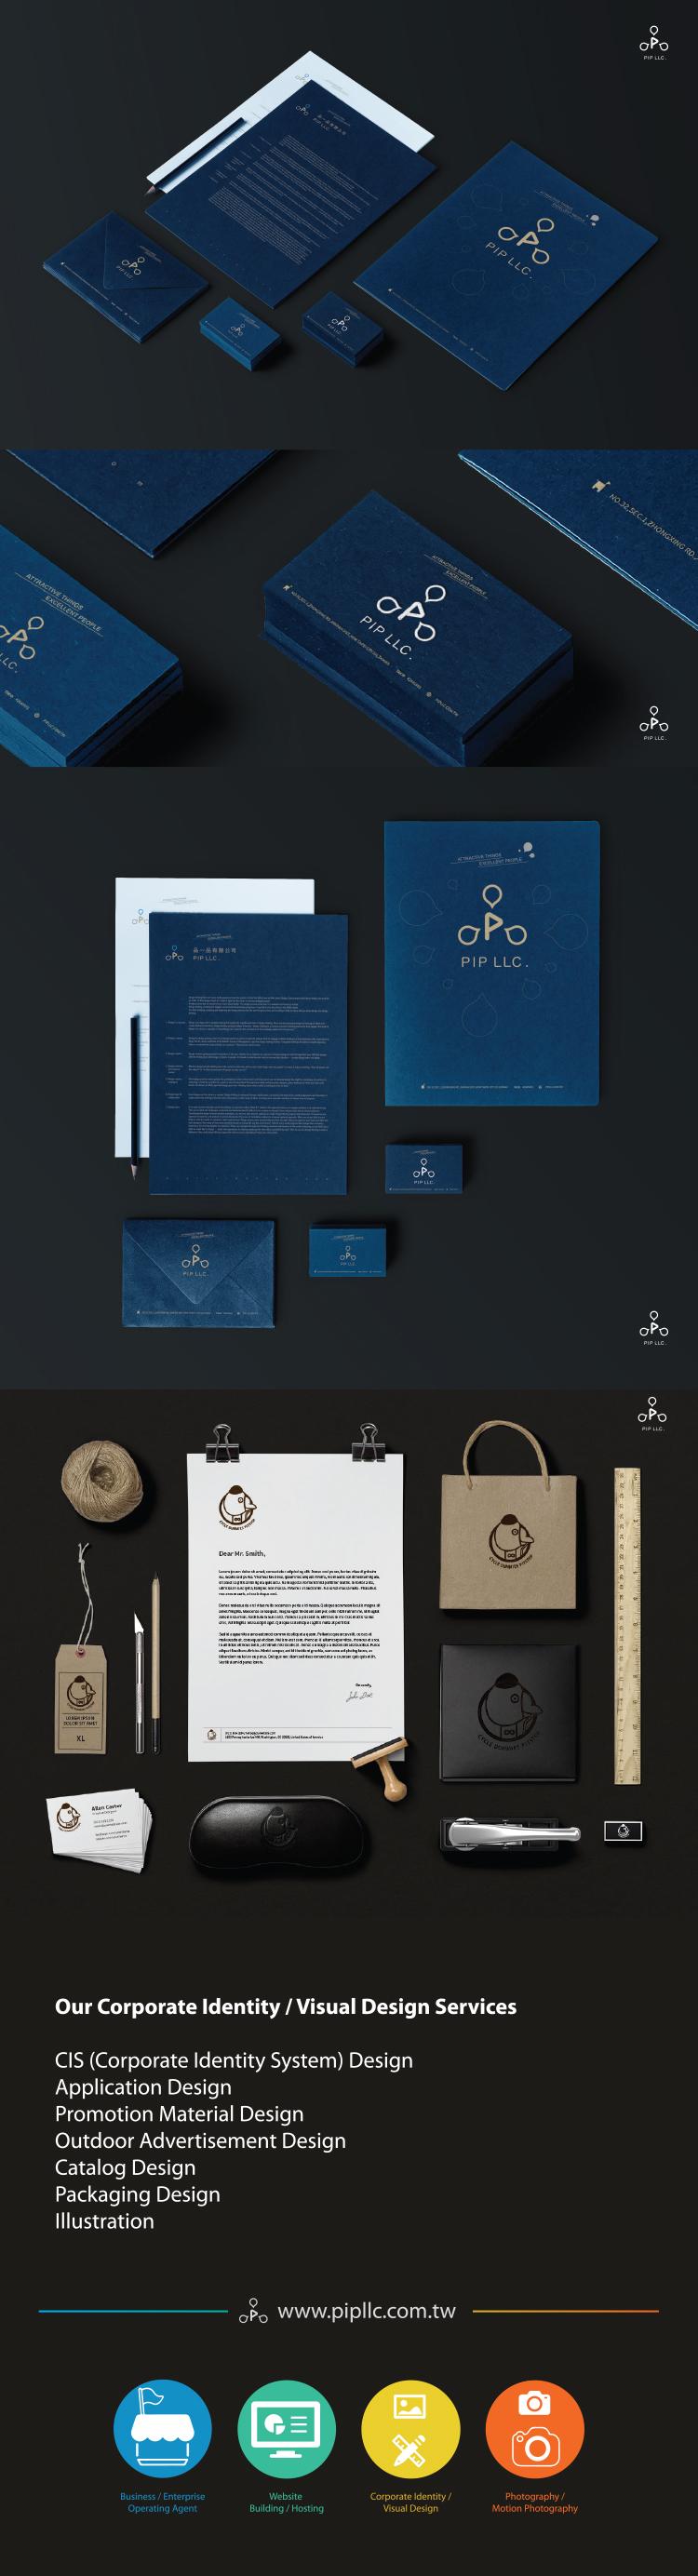 pip-design-service